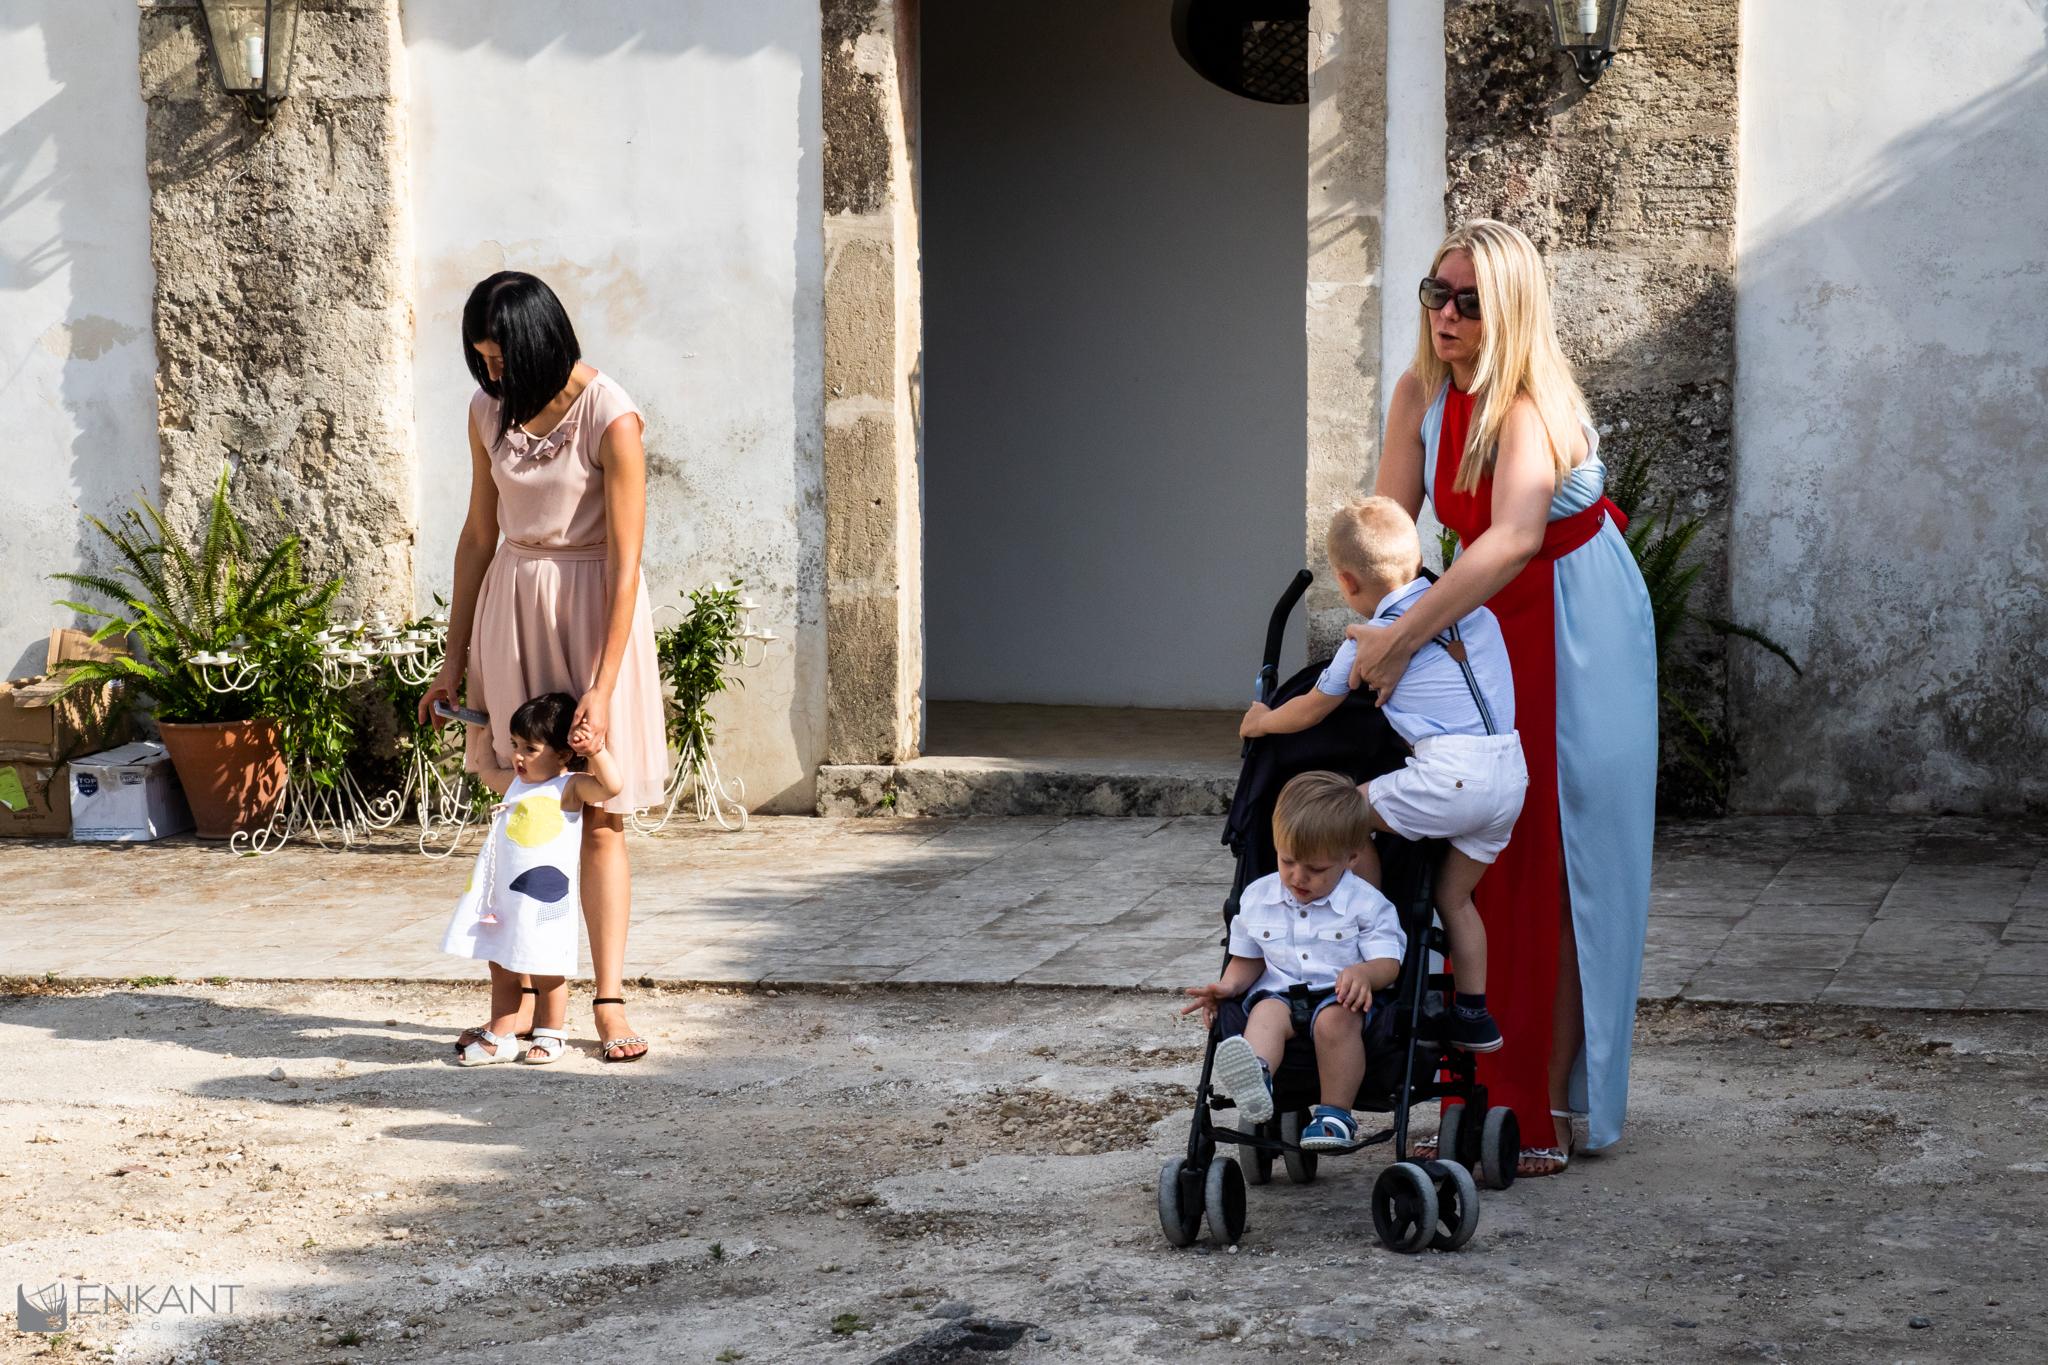 Fotografo matrimonio Sicilia - enkant Imagery-10.jpg